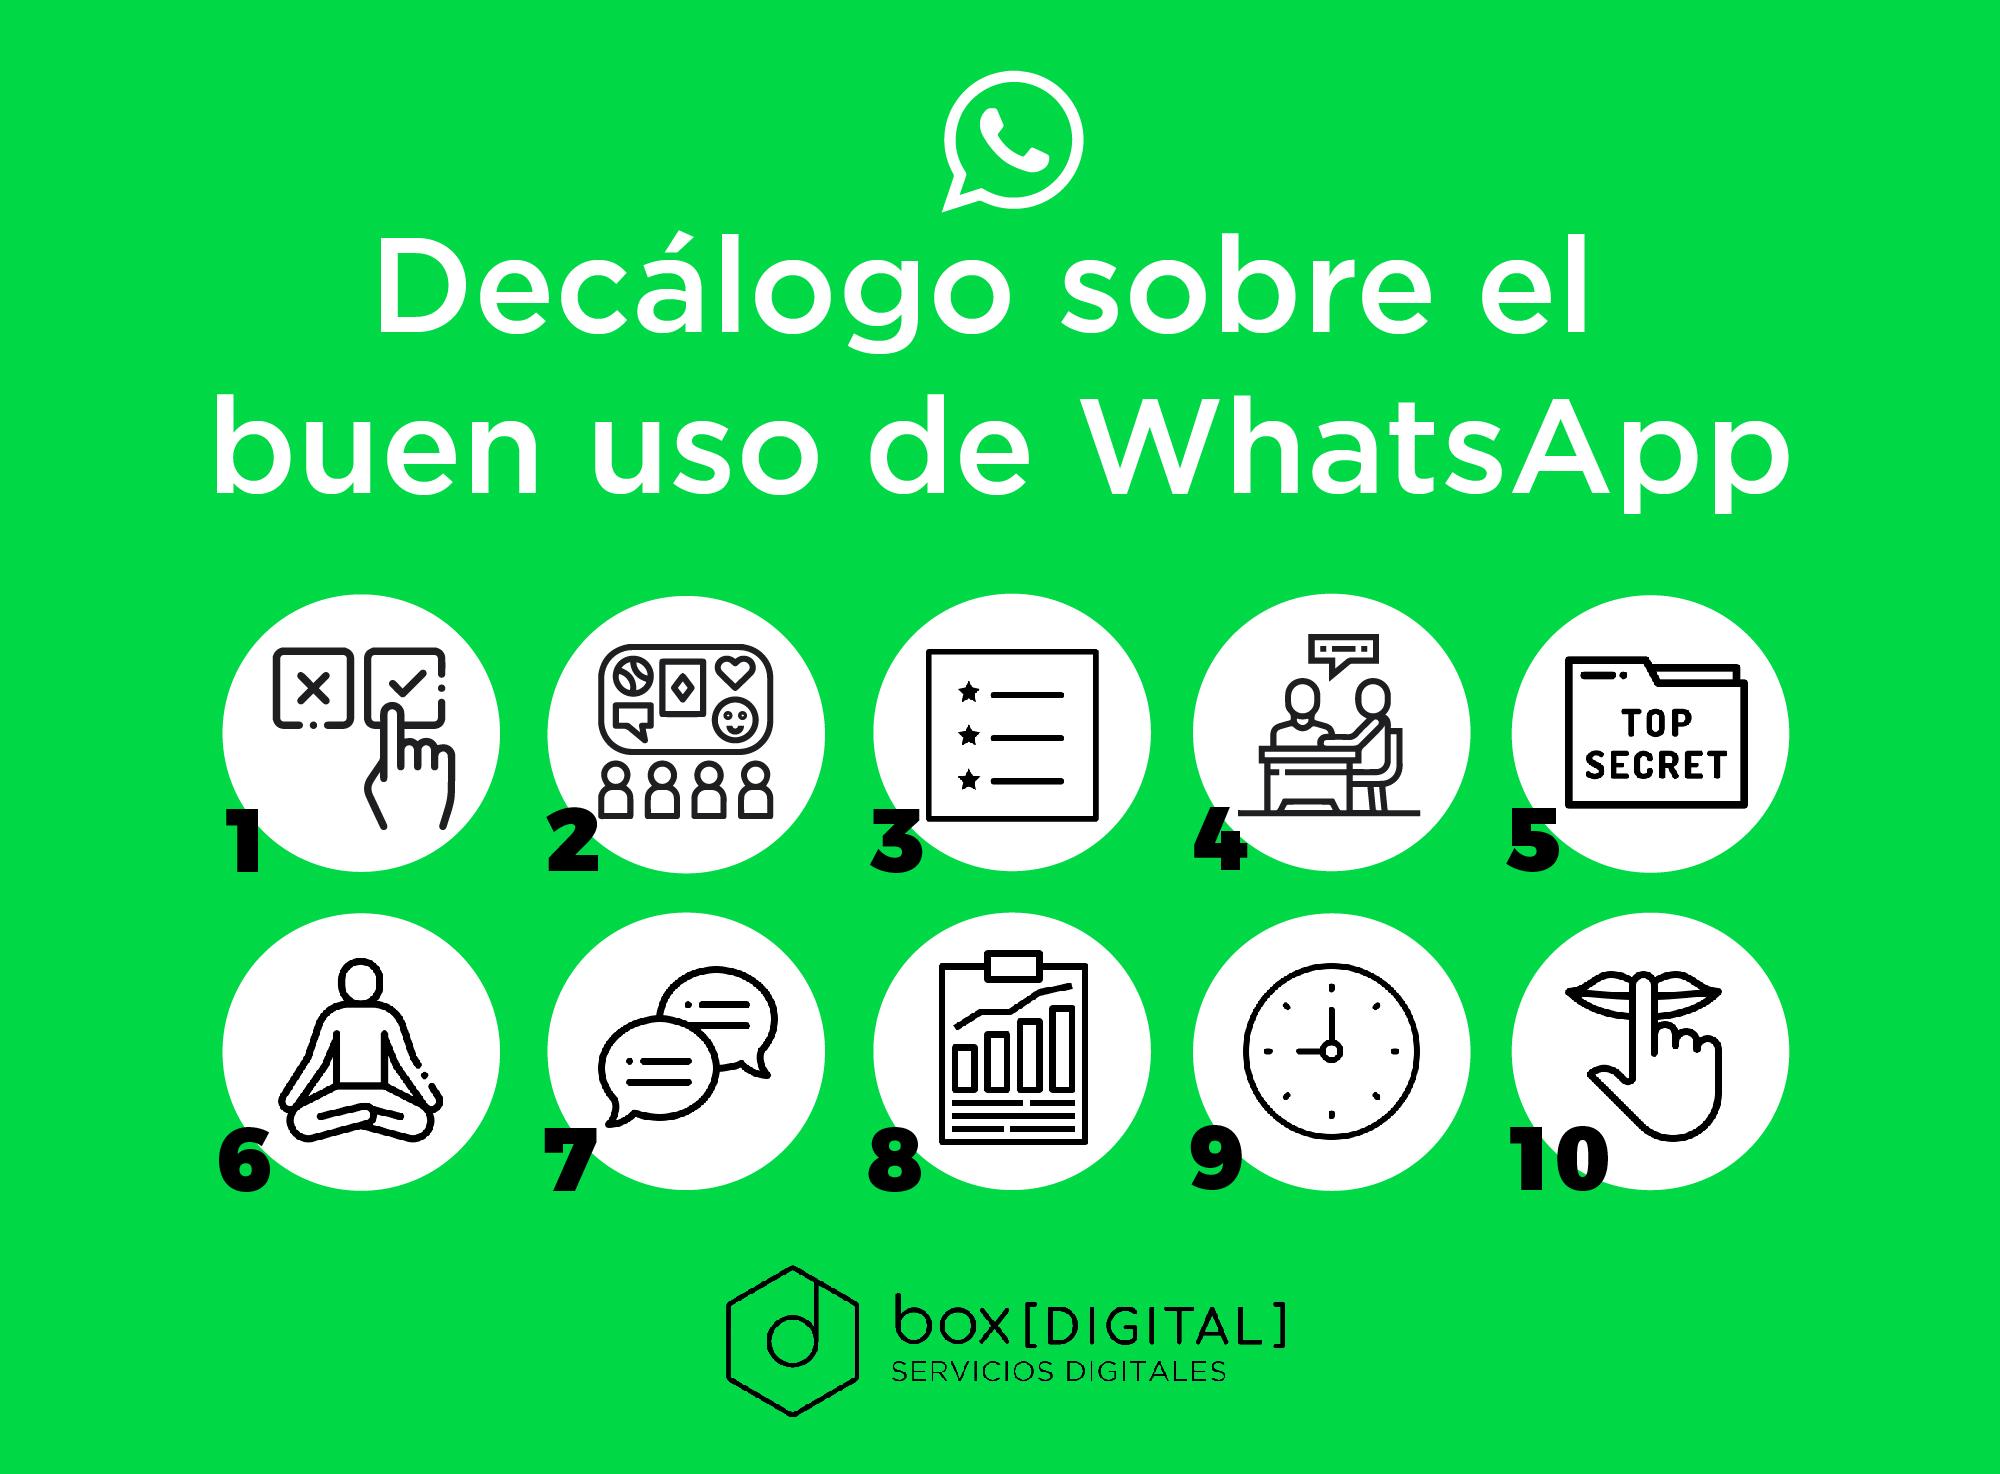 infografia-whatsapp-decalogo